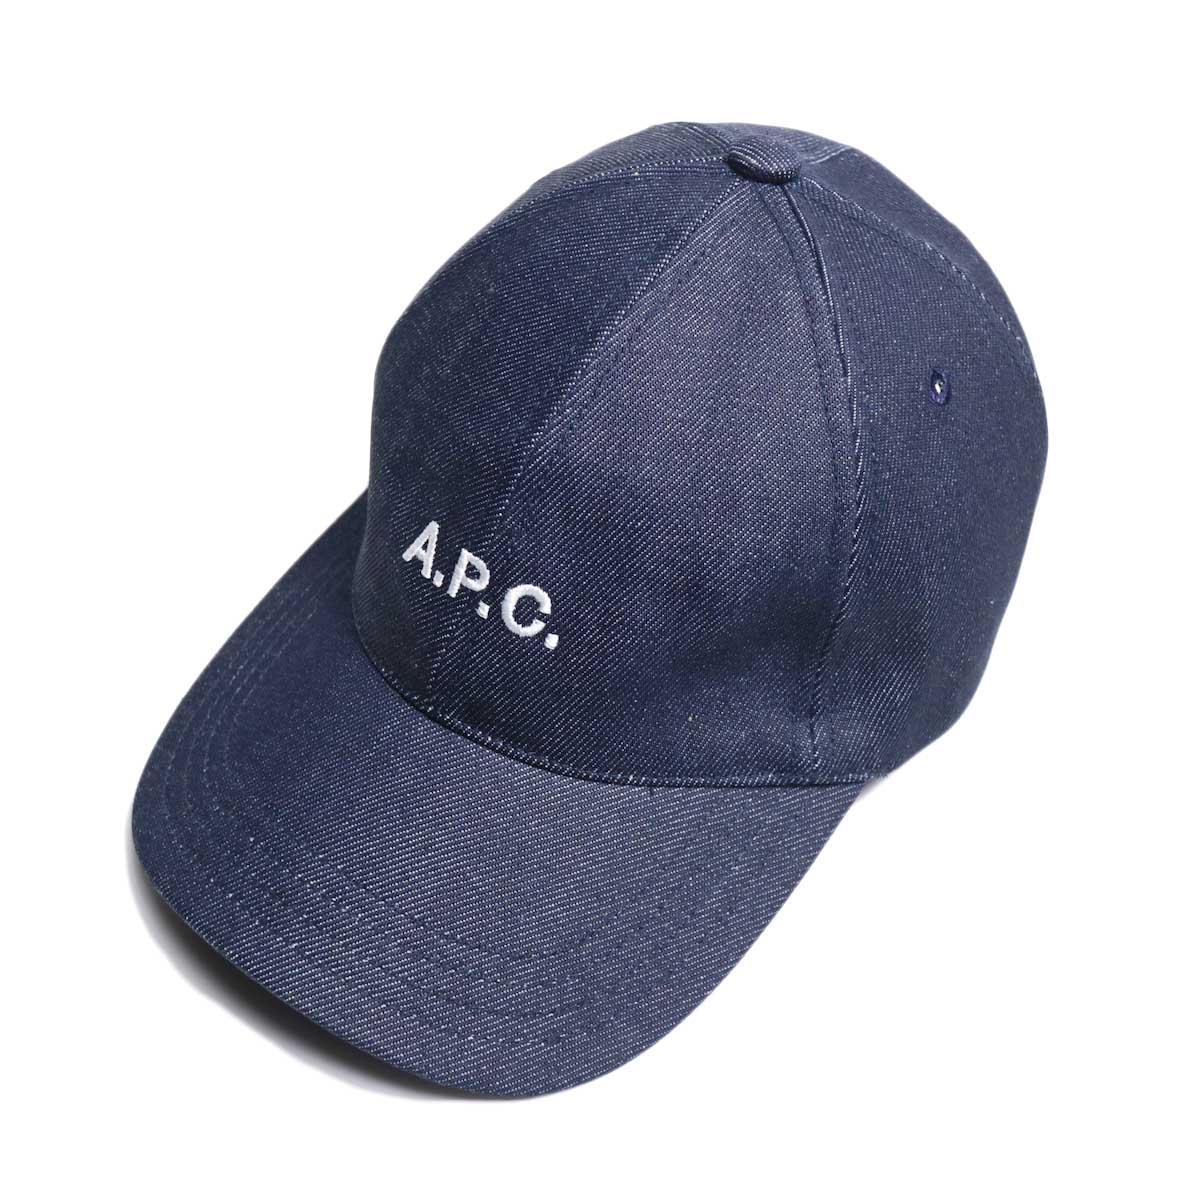 A.P.C / Charlie キャスケット (Indigo)